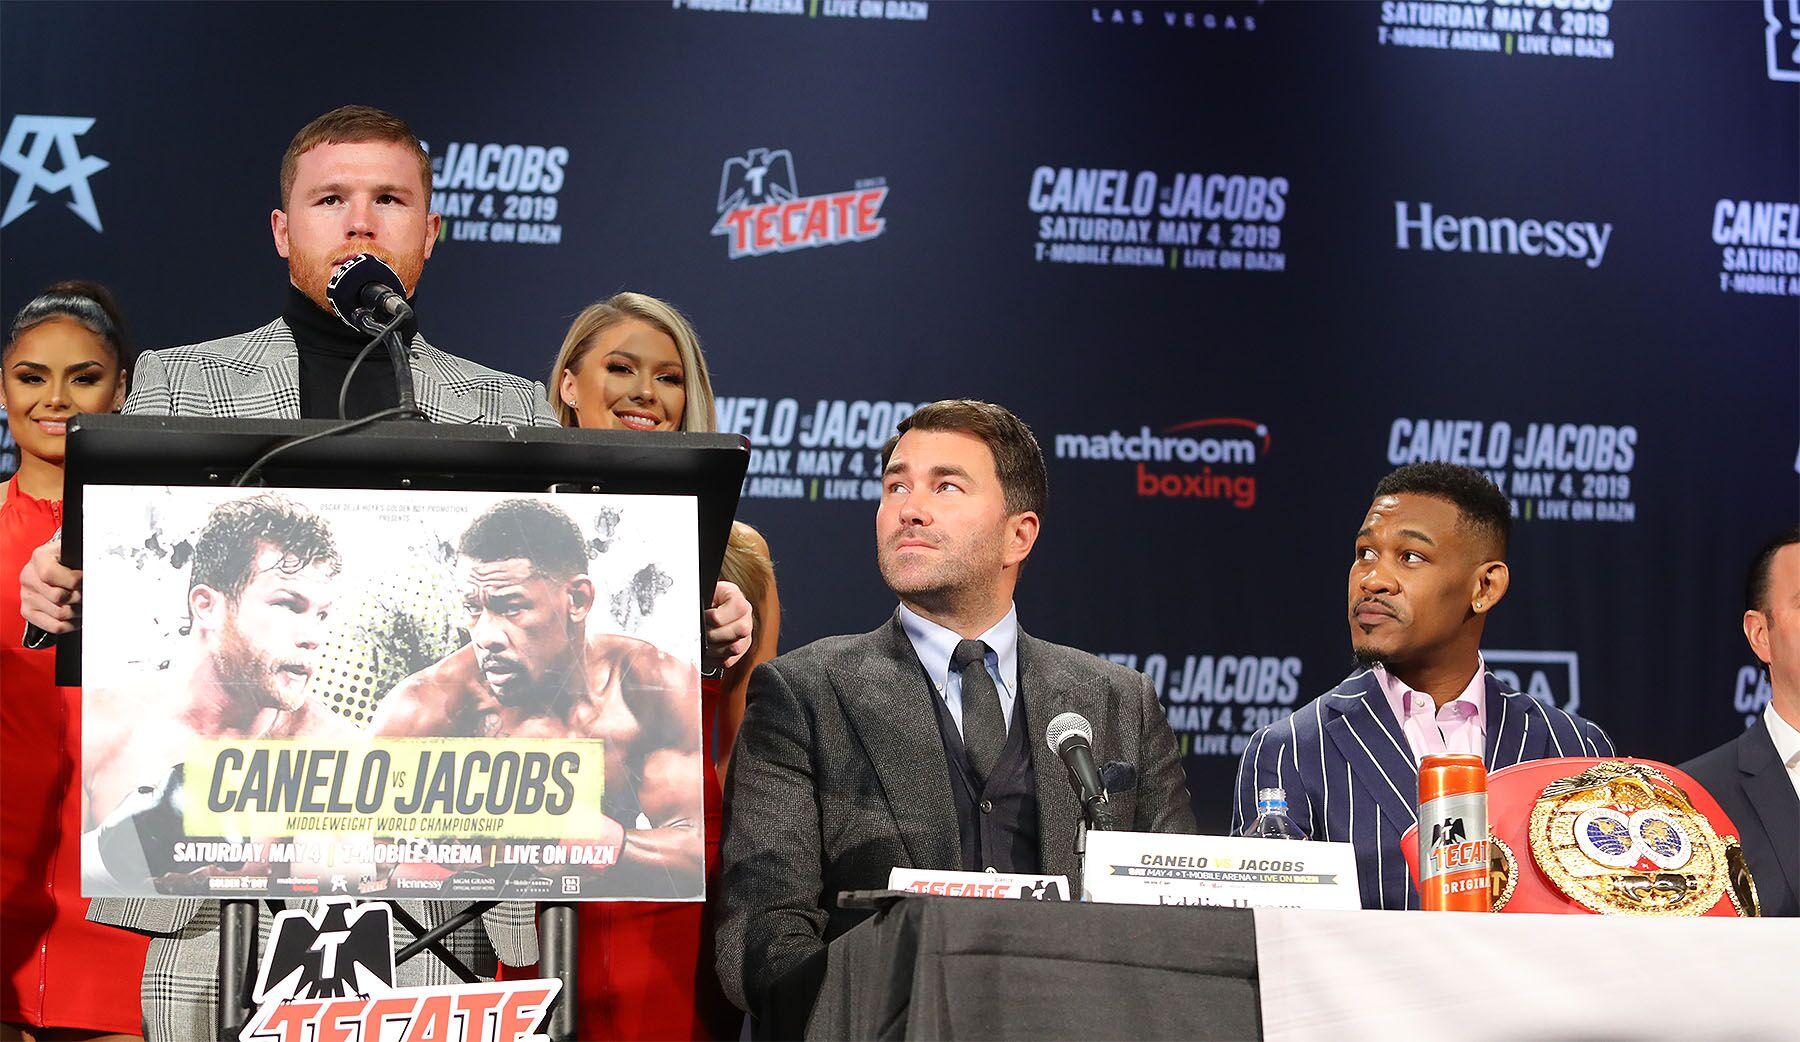 Canelo Alvarez speaks on his upcoming fight with Daniel Jacobs. Photo: Tom Hogan / Golden Boy Promotions